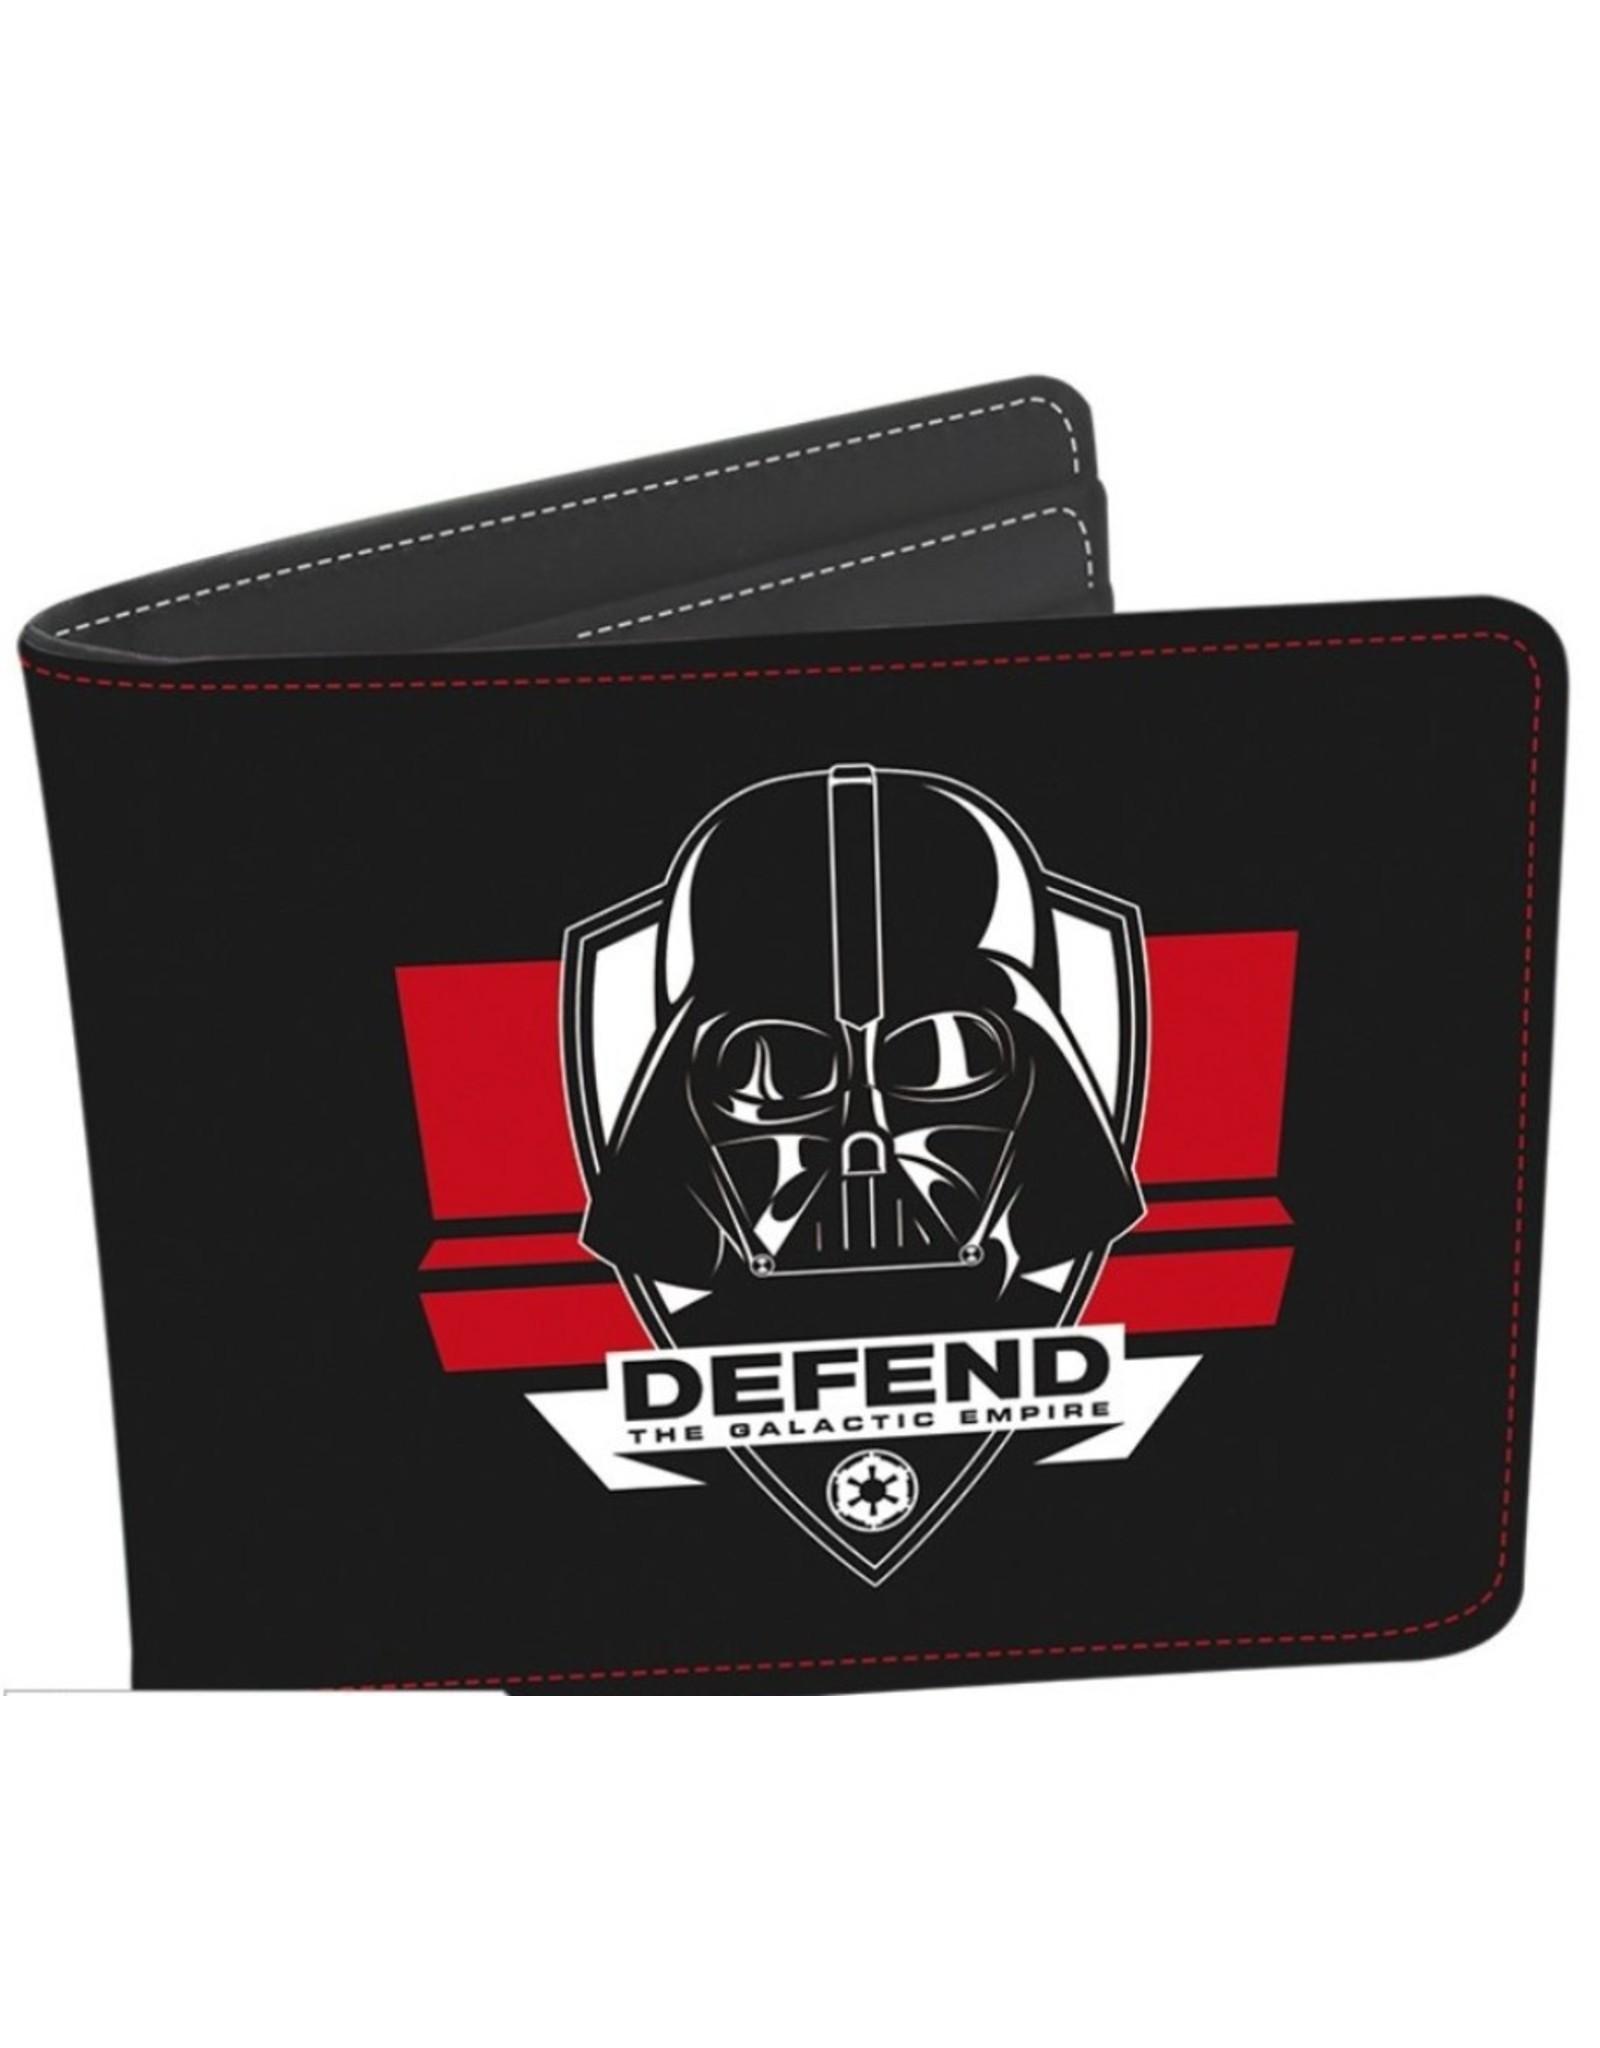 Star Wars Merchandise portemonnees -  Star Wars Darth Vader portemonnee + sleutelhanger